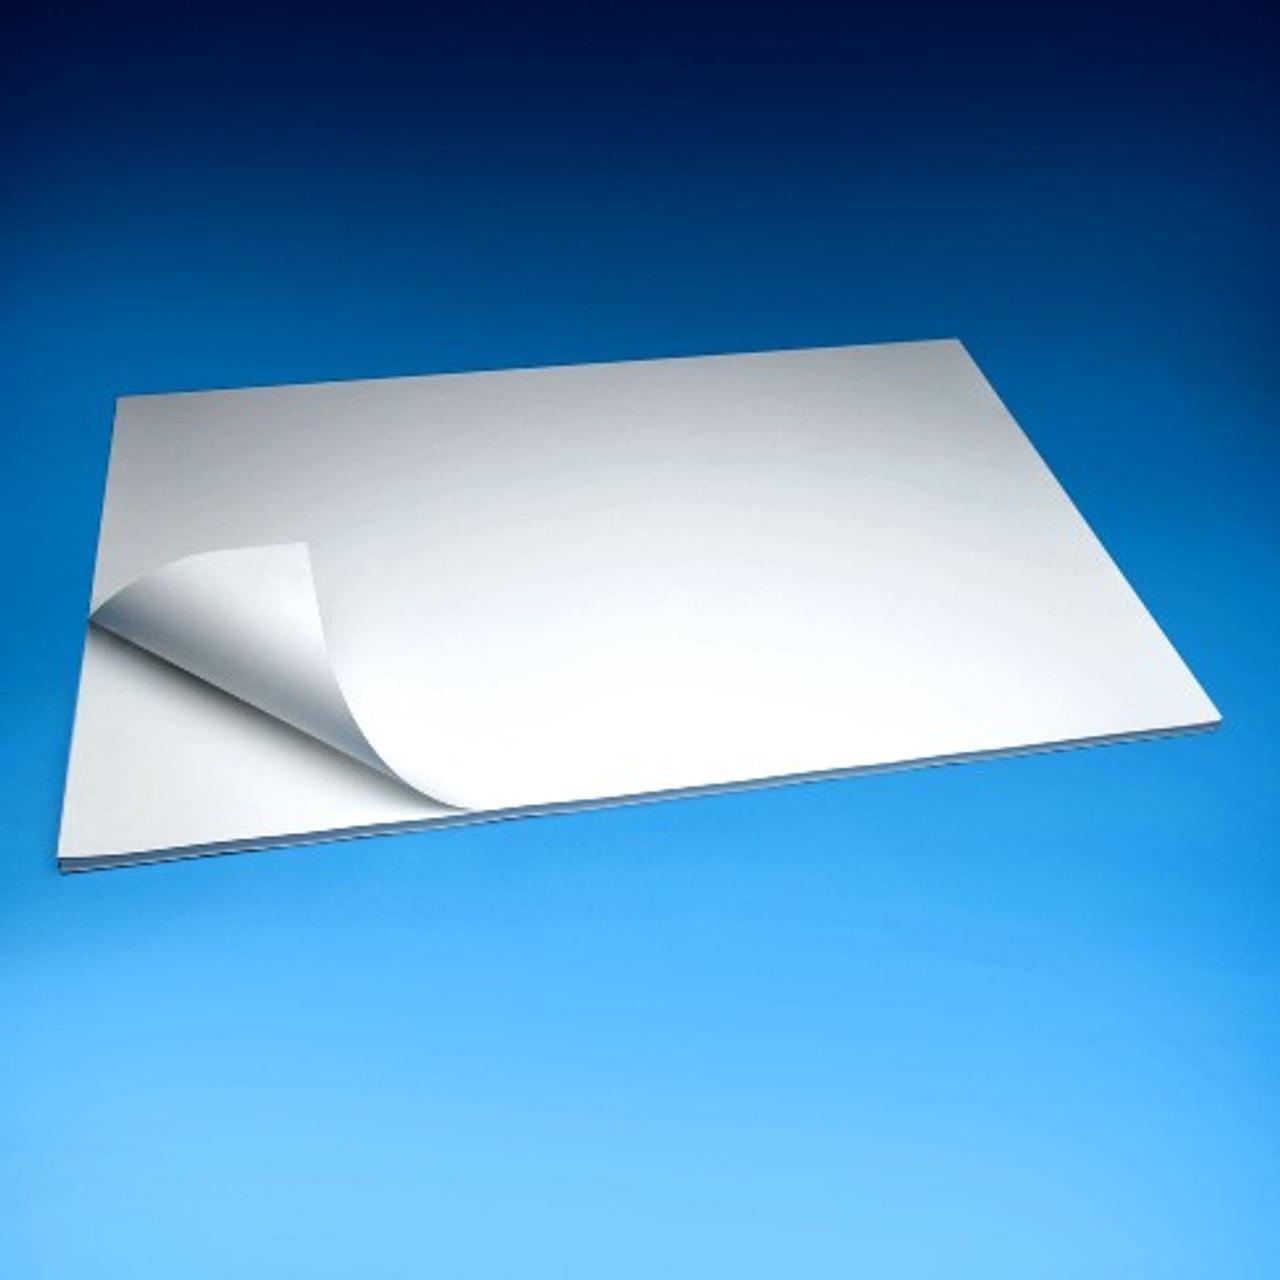 Inkjet Erasable Mylar Film 4 Mil 18 X 24 50 Sheets 7924d026